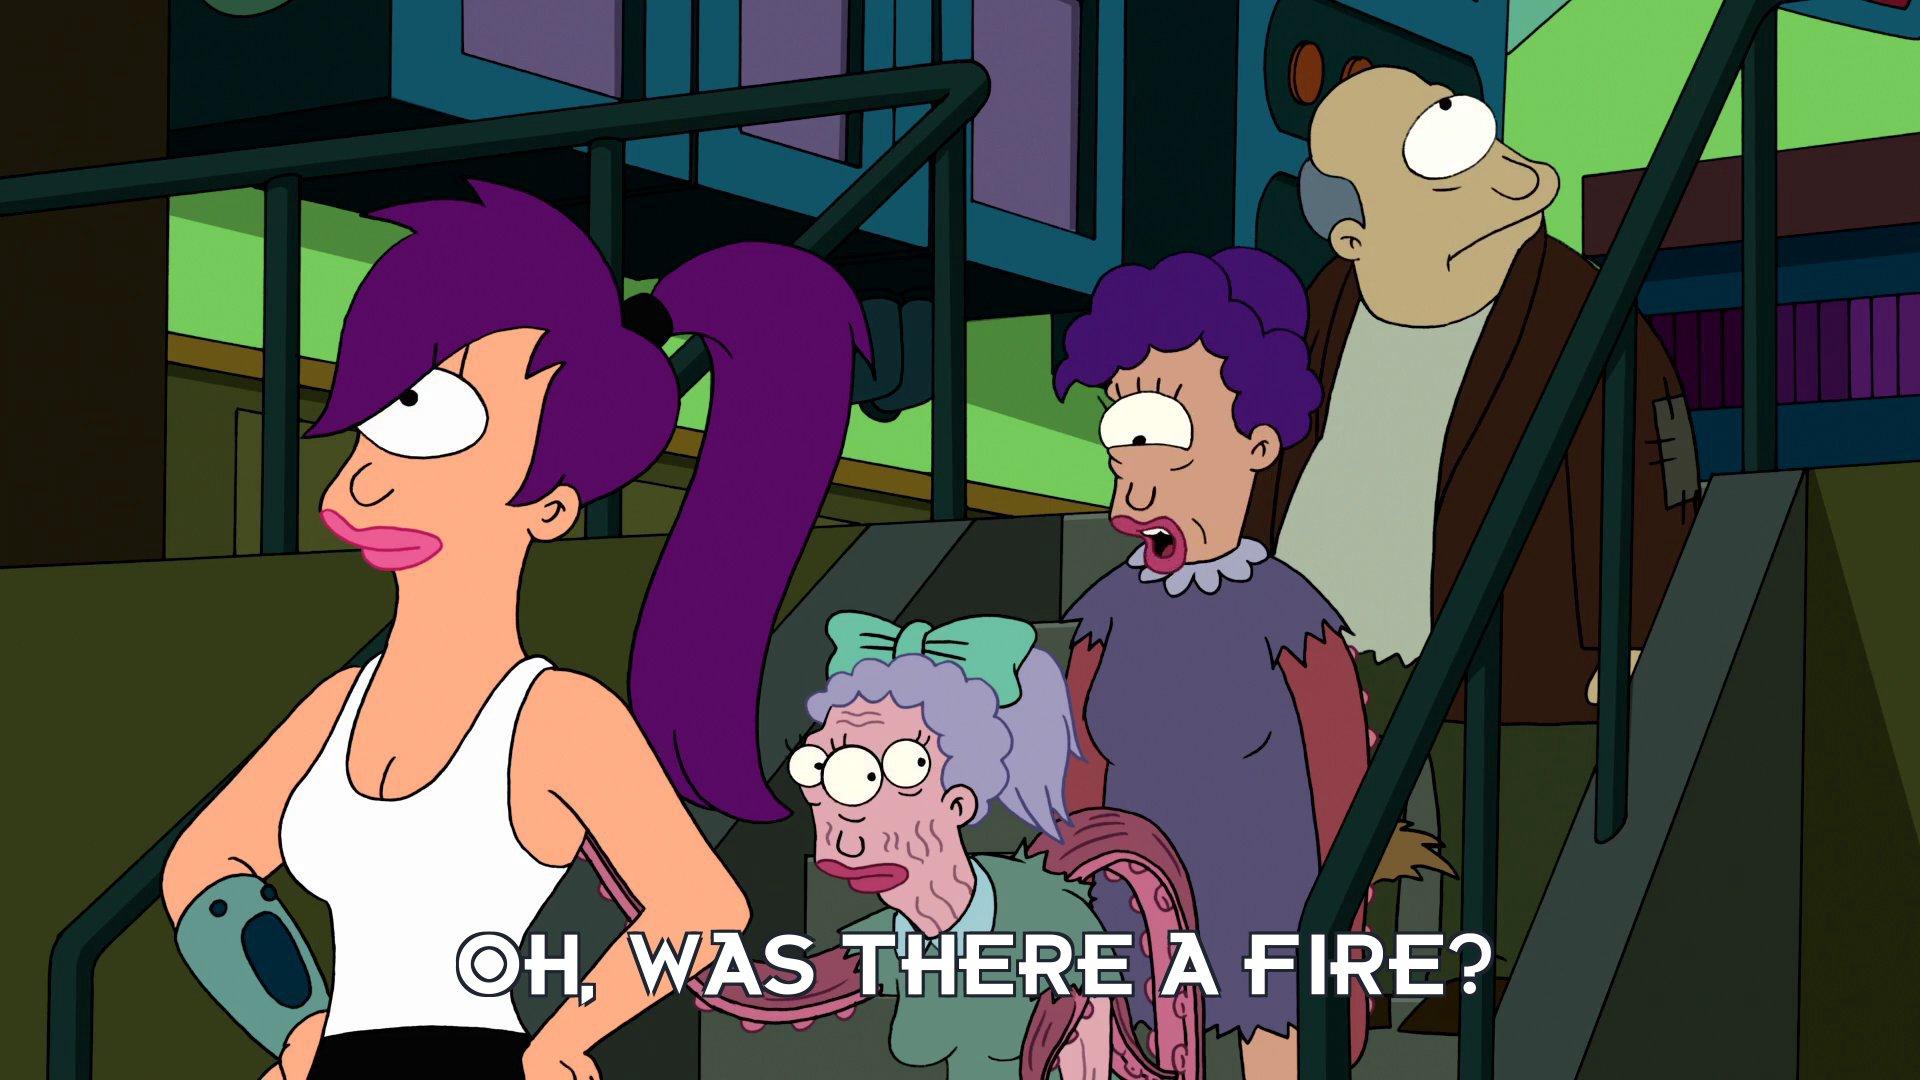 Turanga Munda: Oh, was there a fire?